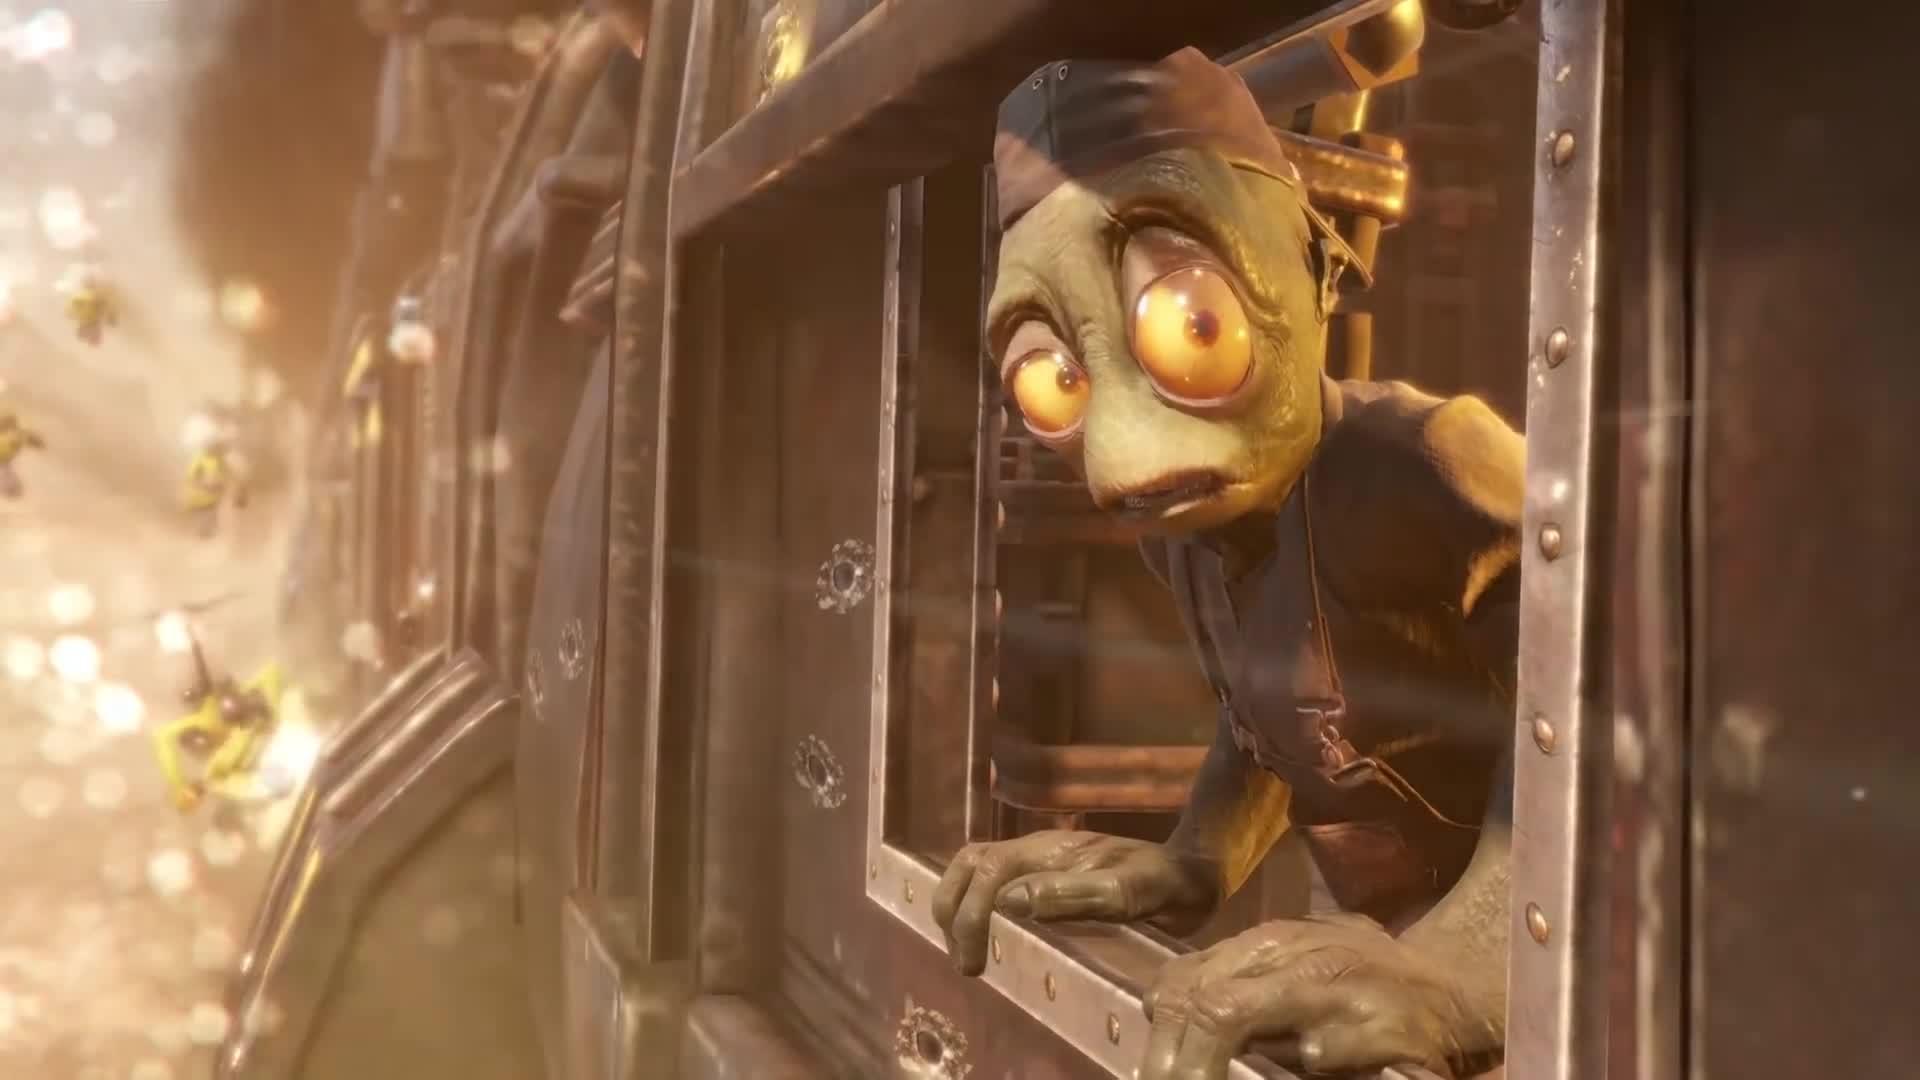 Trailer, Jump & Run, GDC, Oddworld, GDC 2019, Oddworld Inhabitants, Oddworld Soulstorm